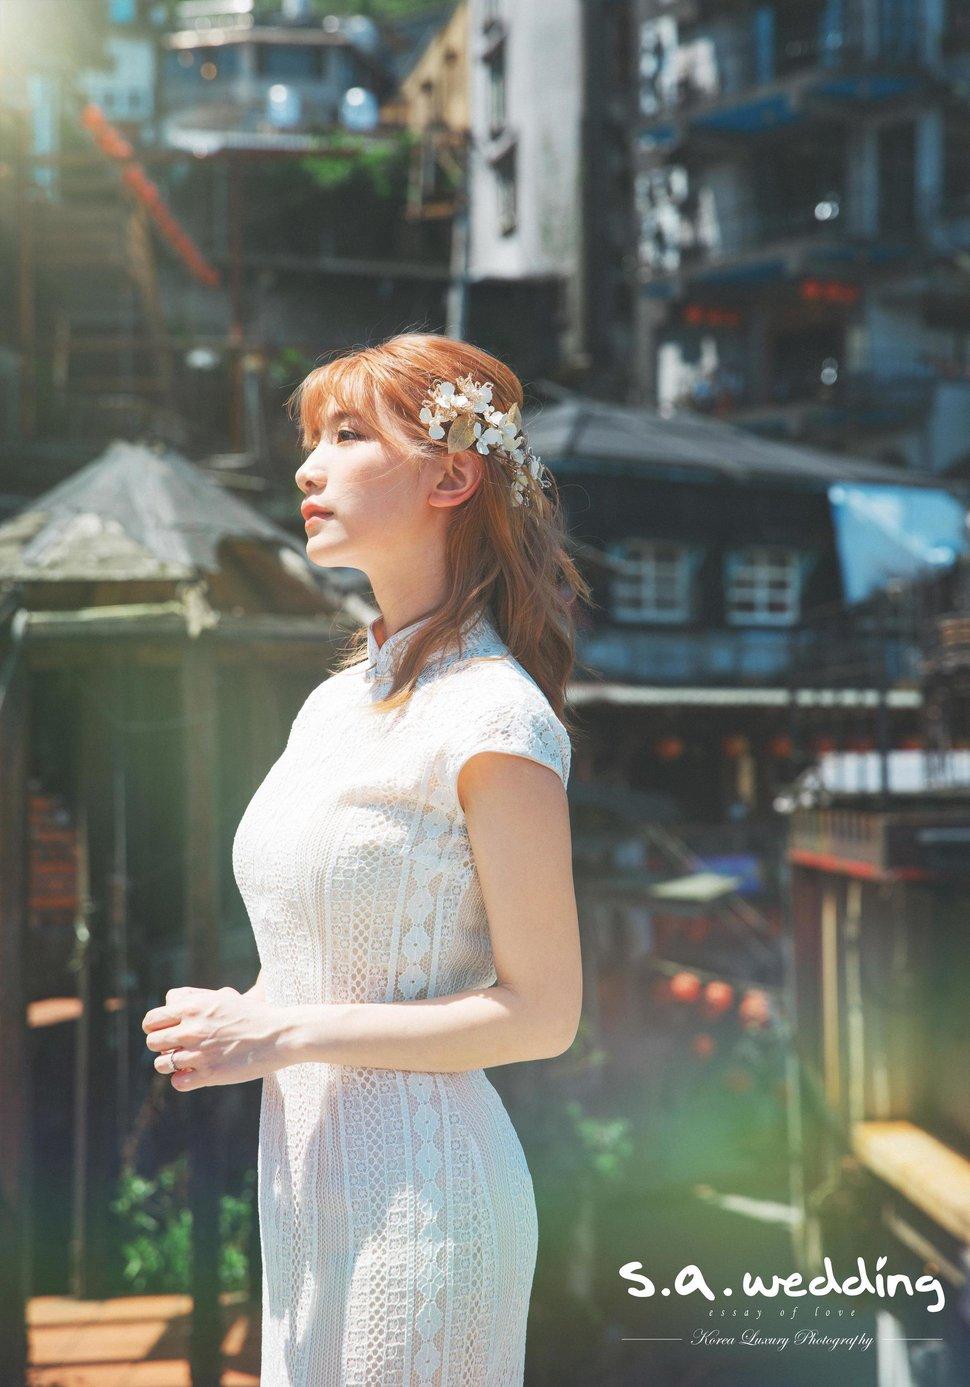 NSH_0449_ps (Copy) - s.a. wedding 韓國婚紗攝影《結婚吧》